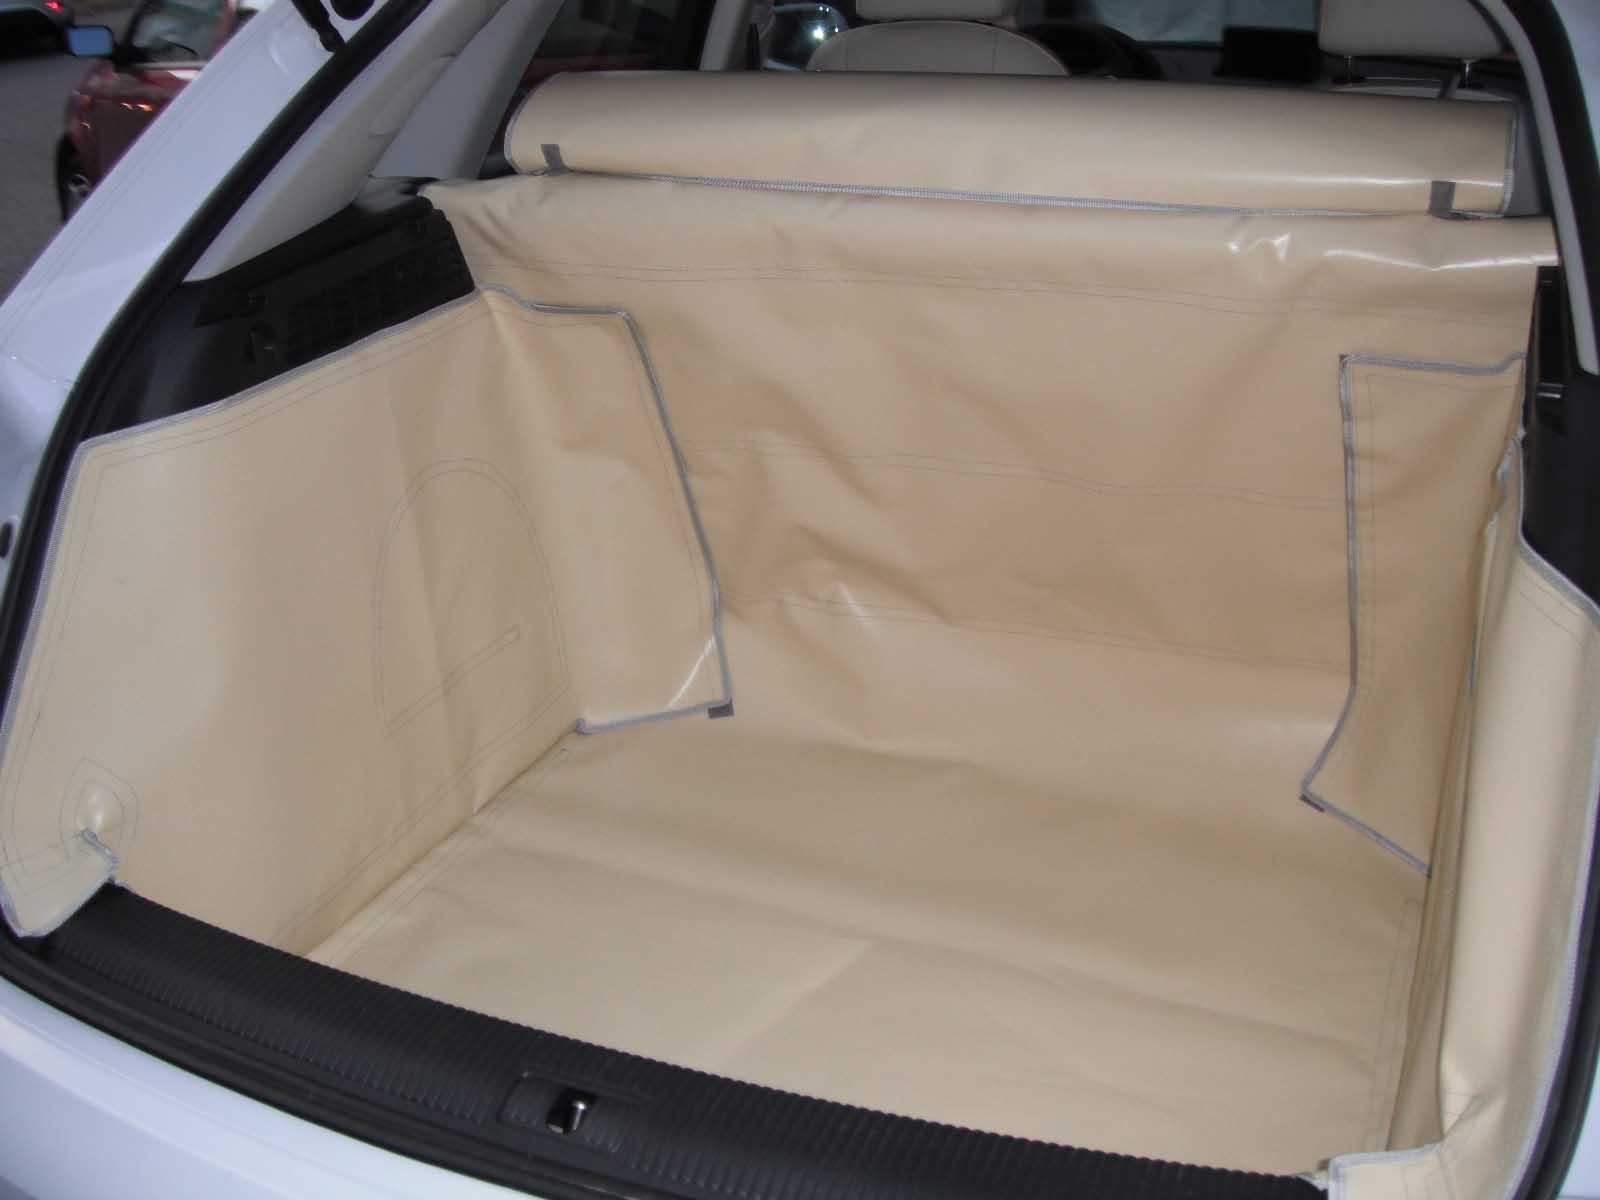 Salva baule Audi Q3 telo cane